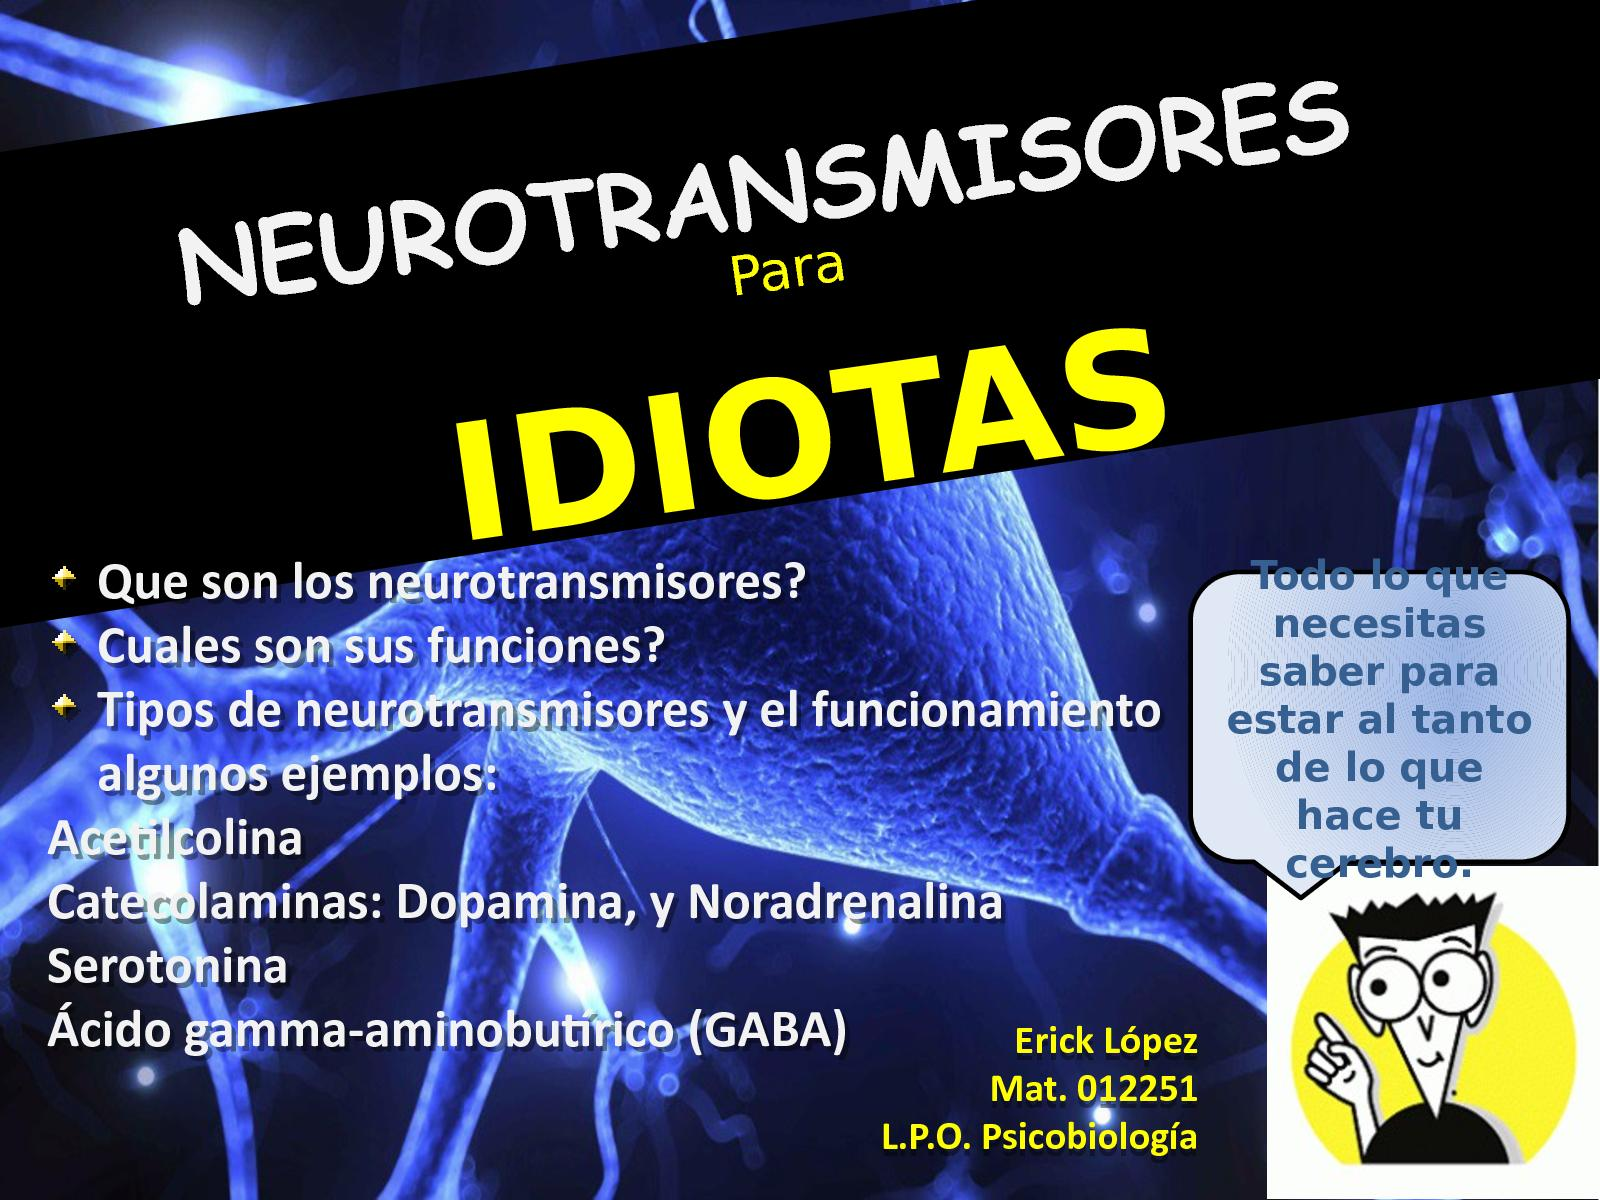 Neurotransmisores Calameo Downloader